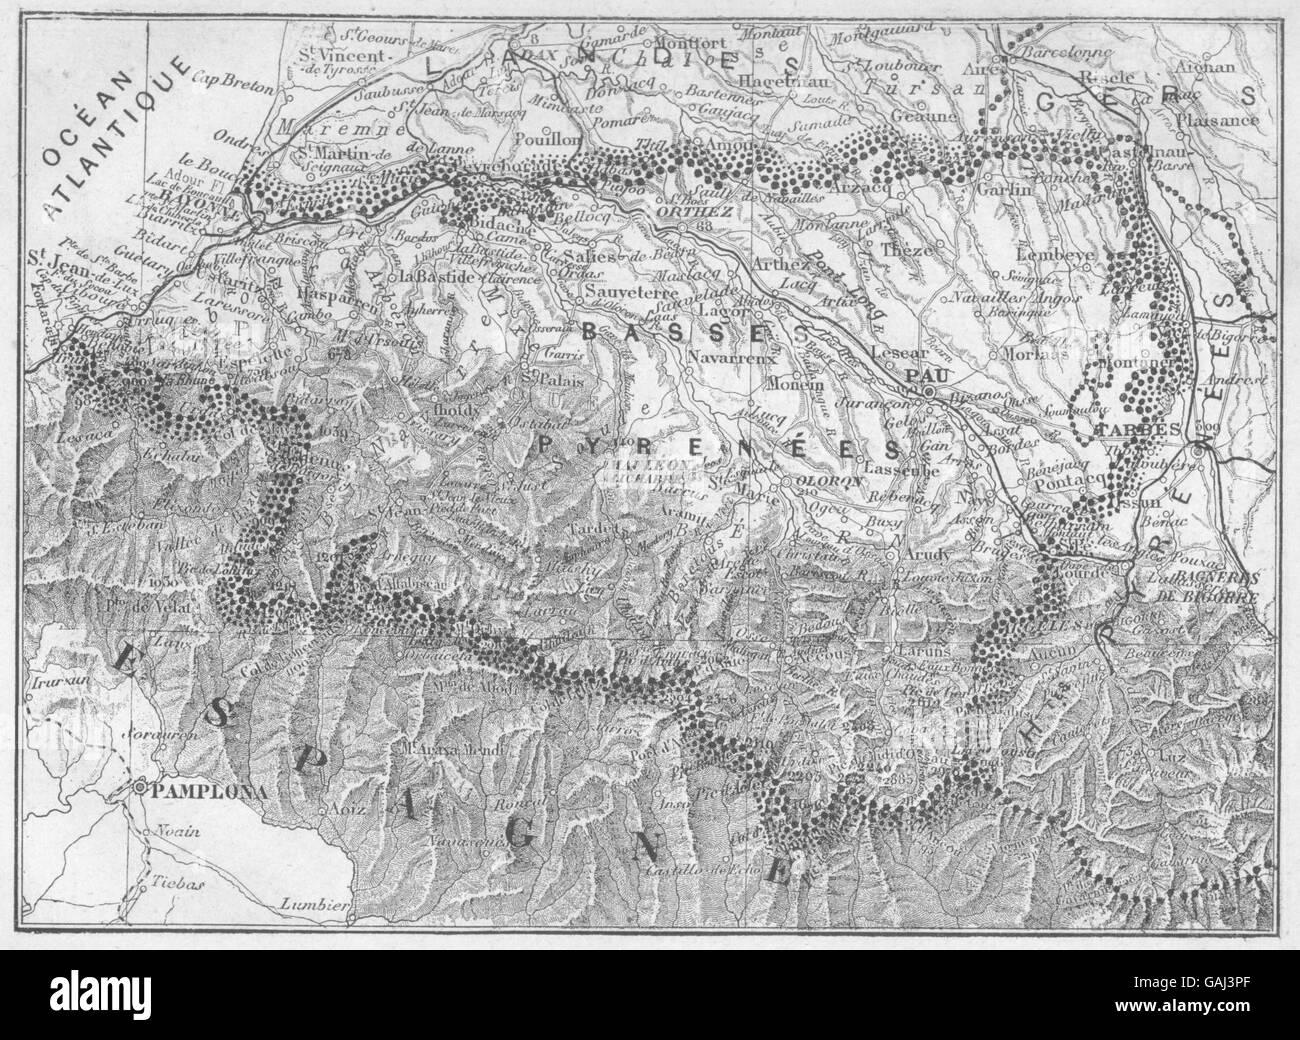 PYRÉNÉES-ATLANTIQUESCACHED SIMILAR: Pirineos(Basses-), 1878 mapa antiguo Imagen De Stock